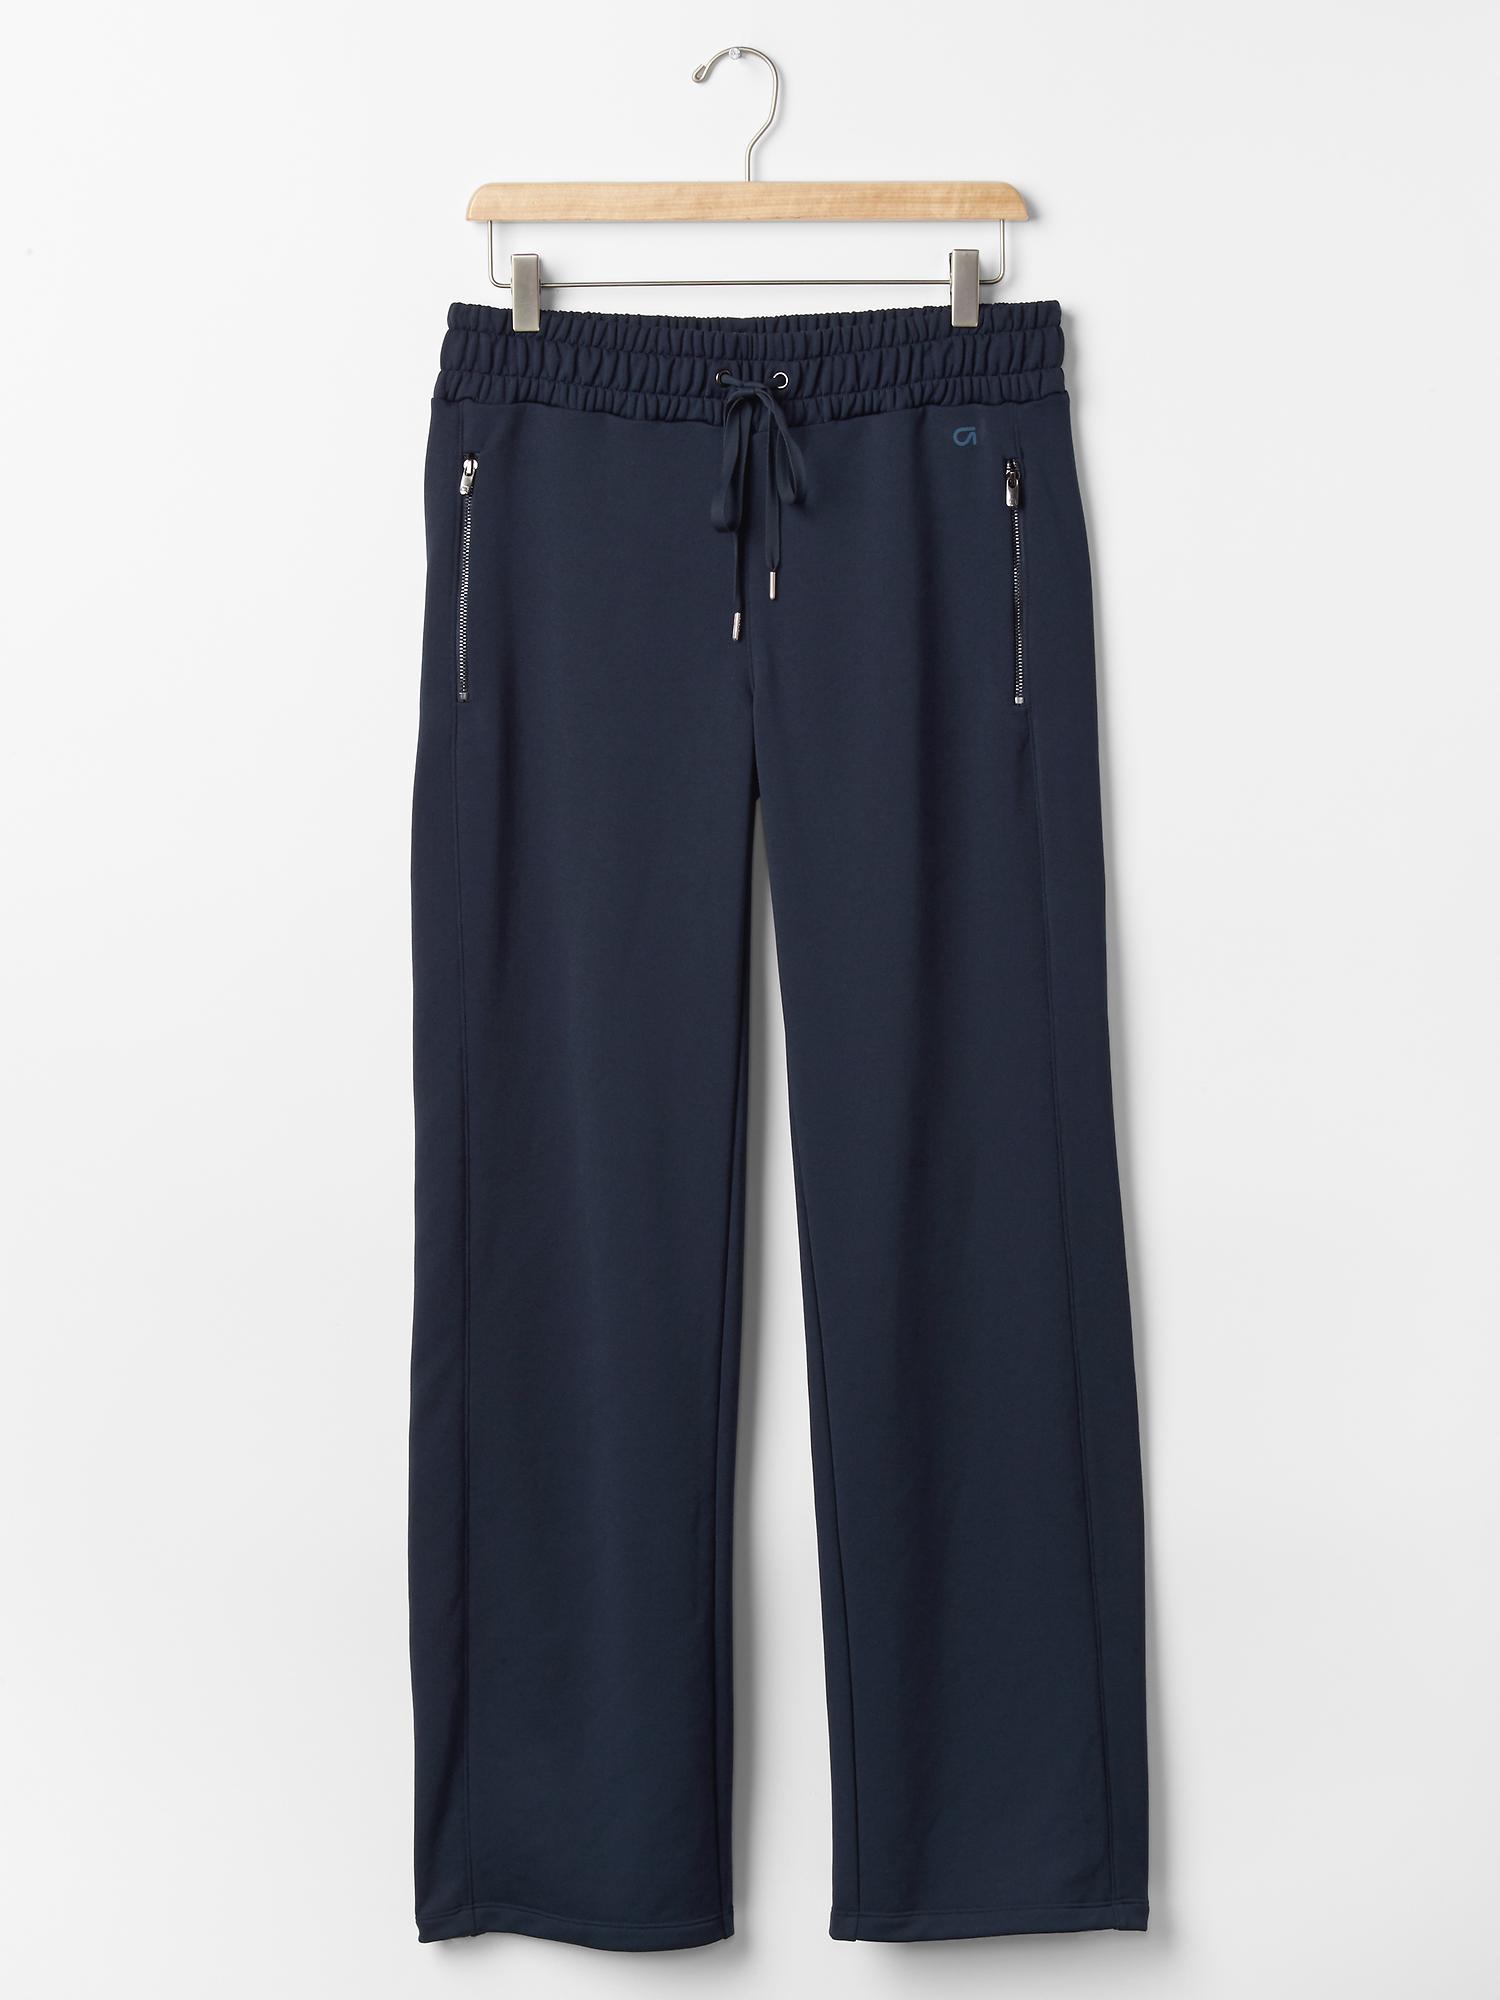 Creative New Women39s Gap Khaki Pants Color  Sage Green Size 0 1 14 NWT